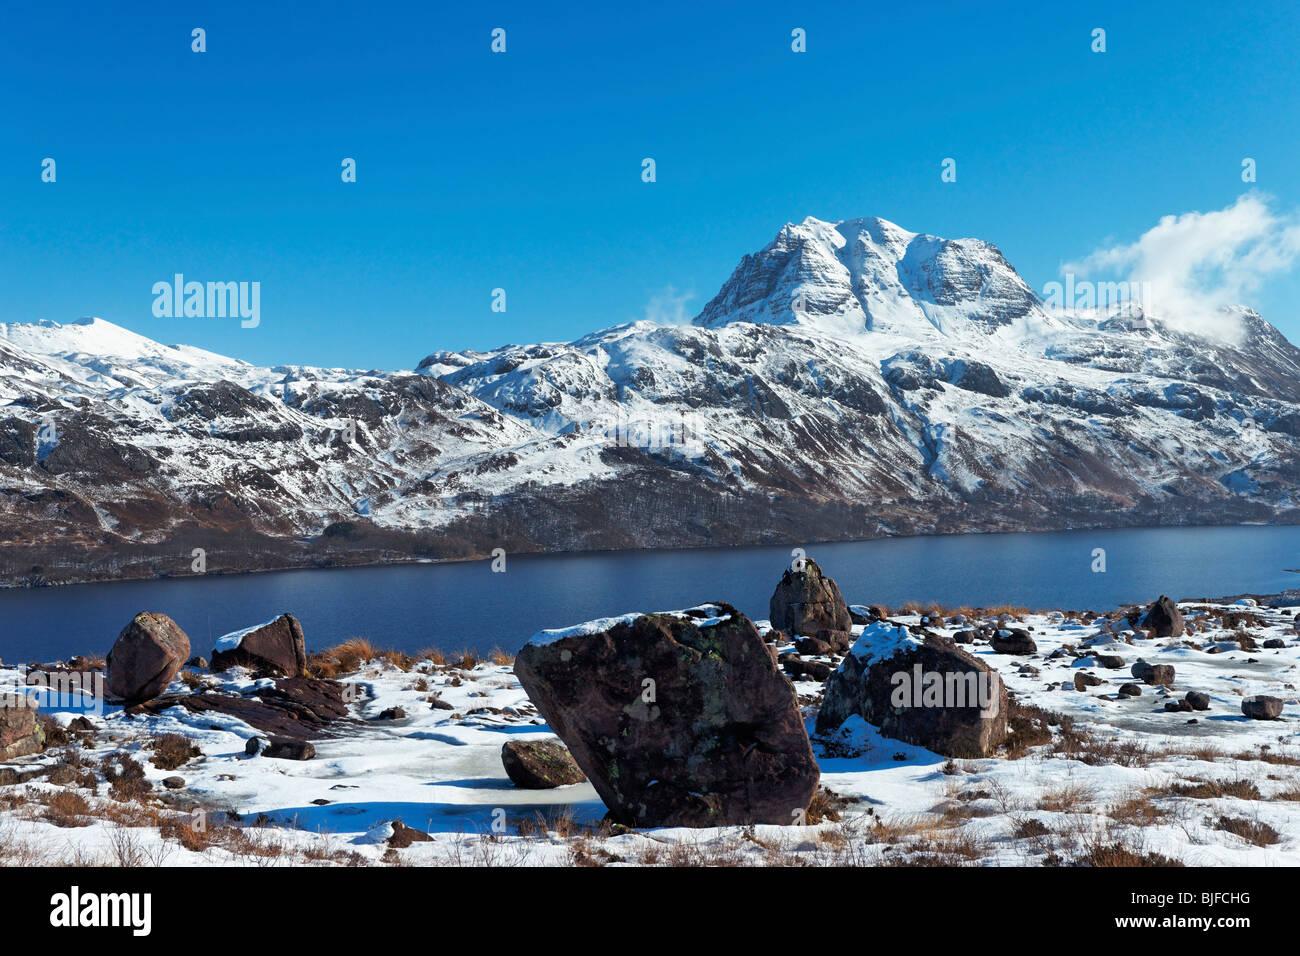 Slioch and Loch Maree, Wester Ross, Highland, Scotland, UK. - Stock Image